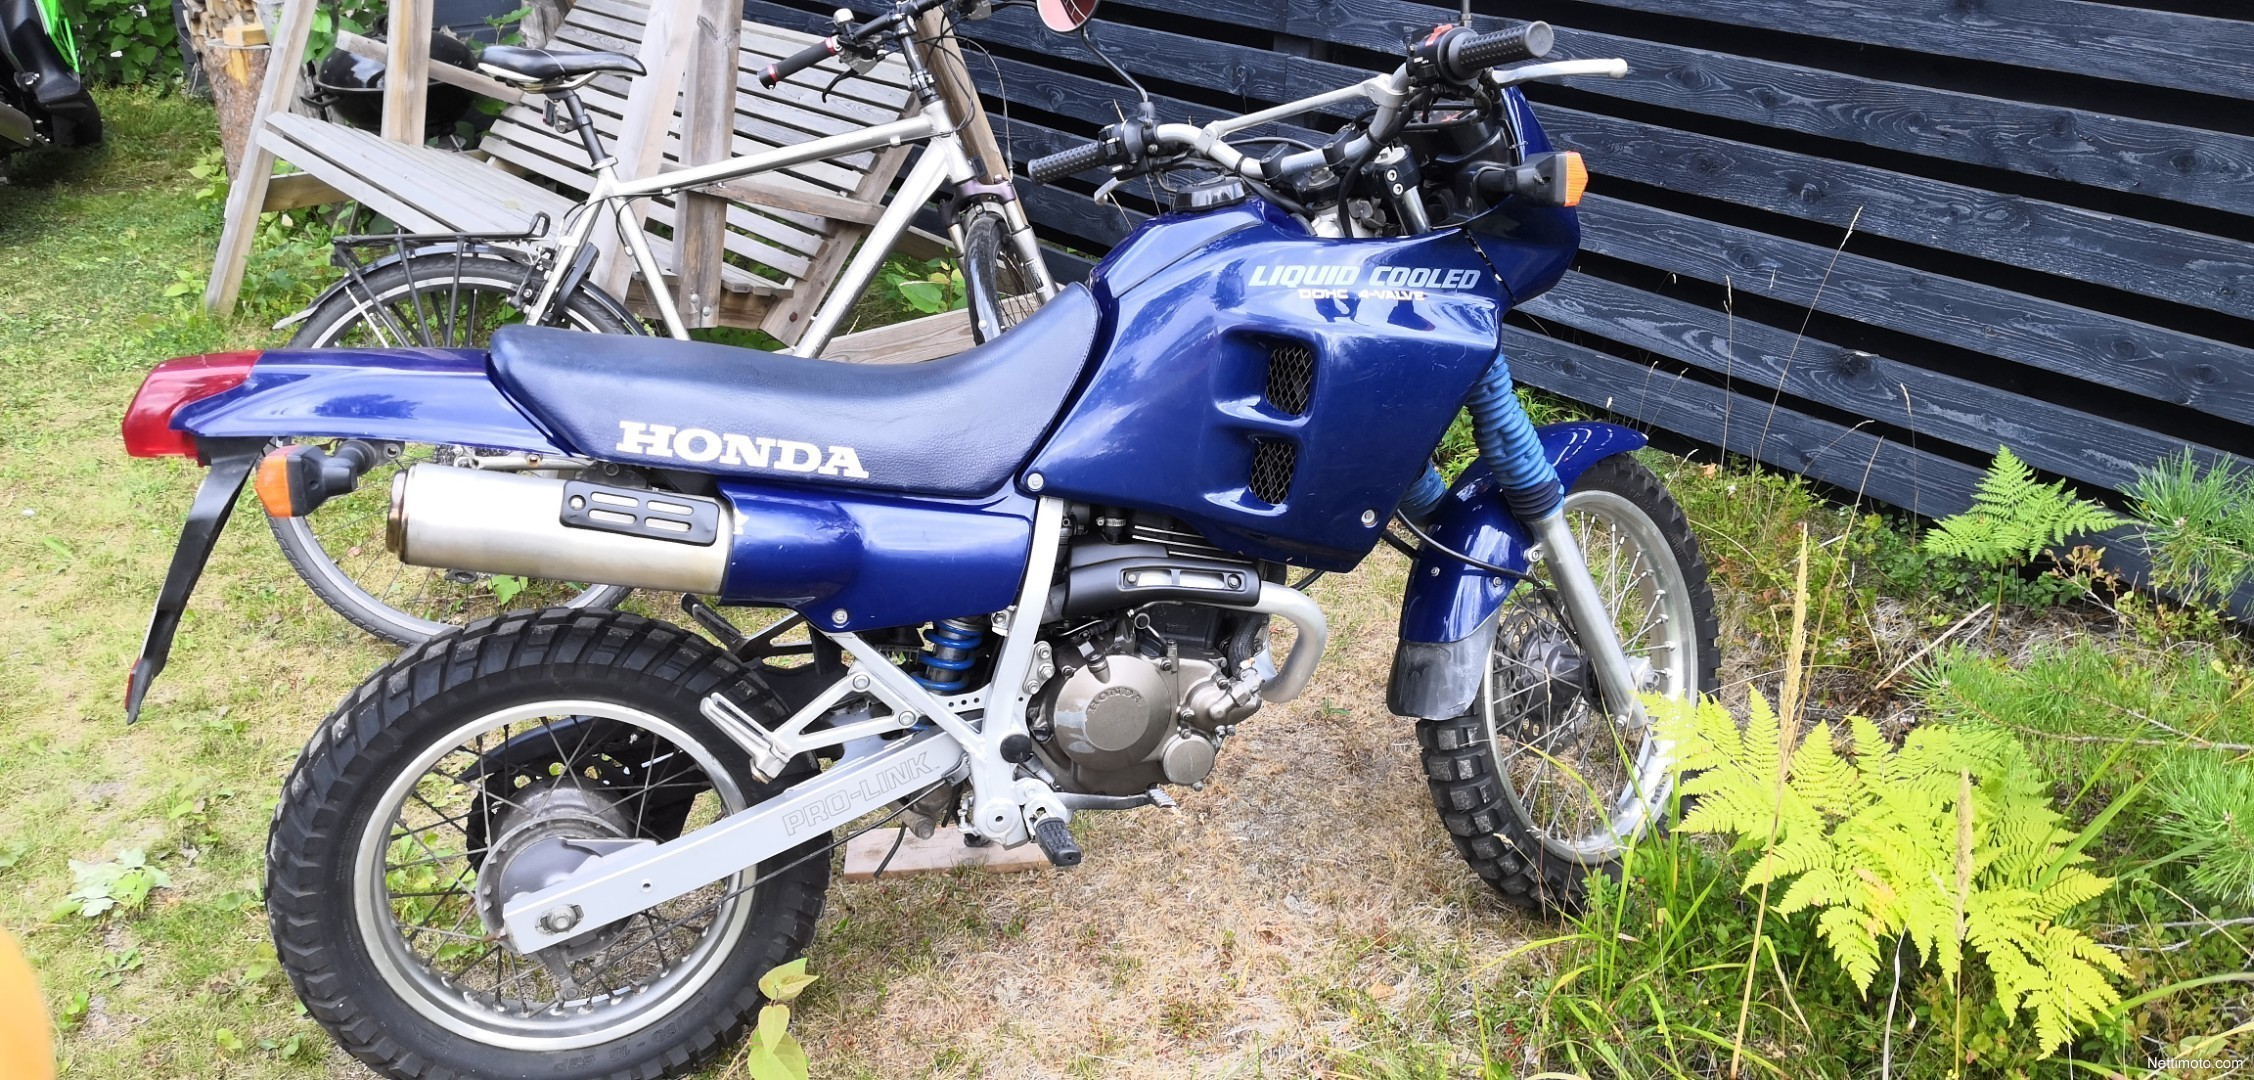 Honda NX 250 Dominator 250 cm³ 1995 - Suonenjoki